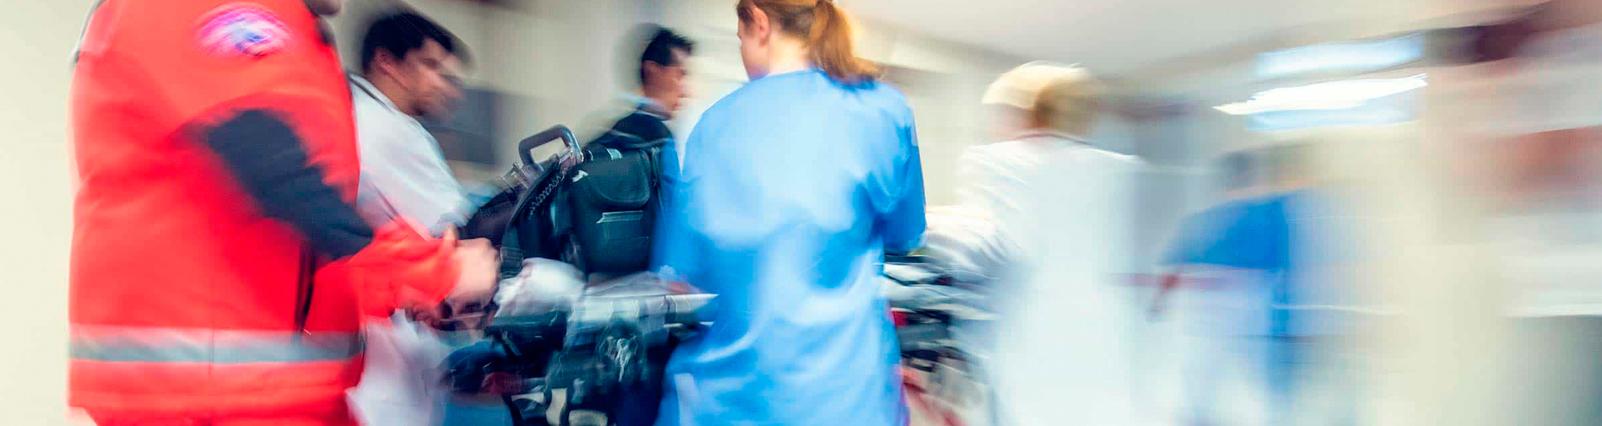 Novo curso de Emergência e Terapia Intensiva para a Enfermagem